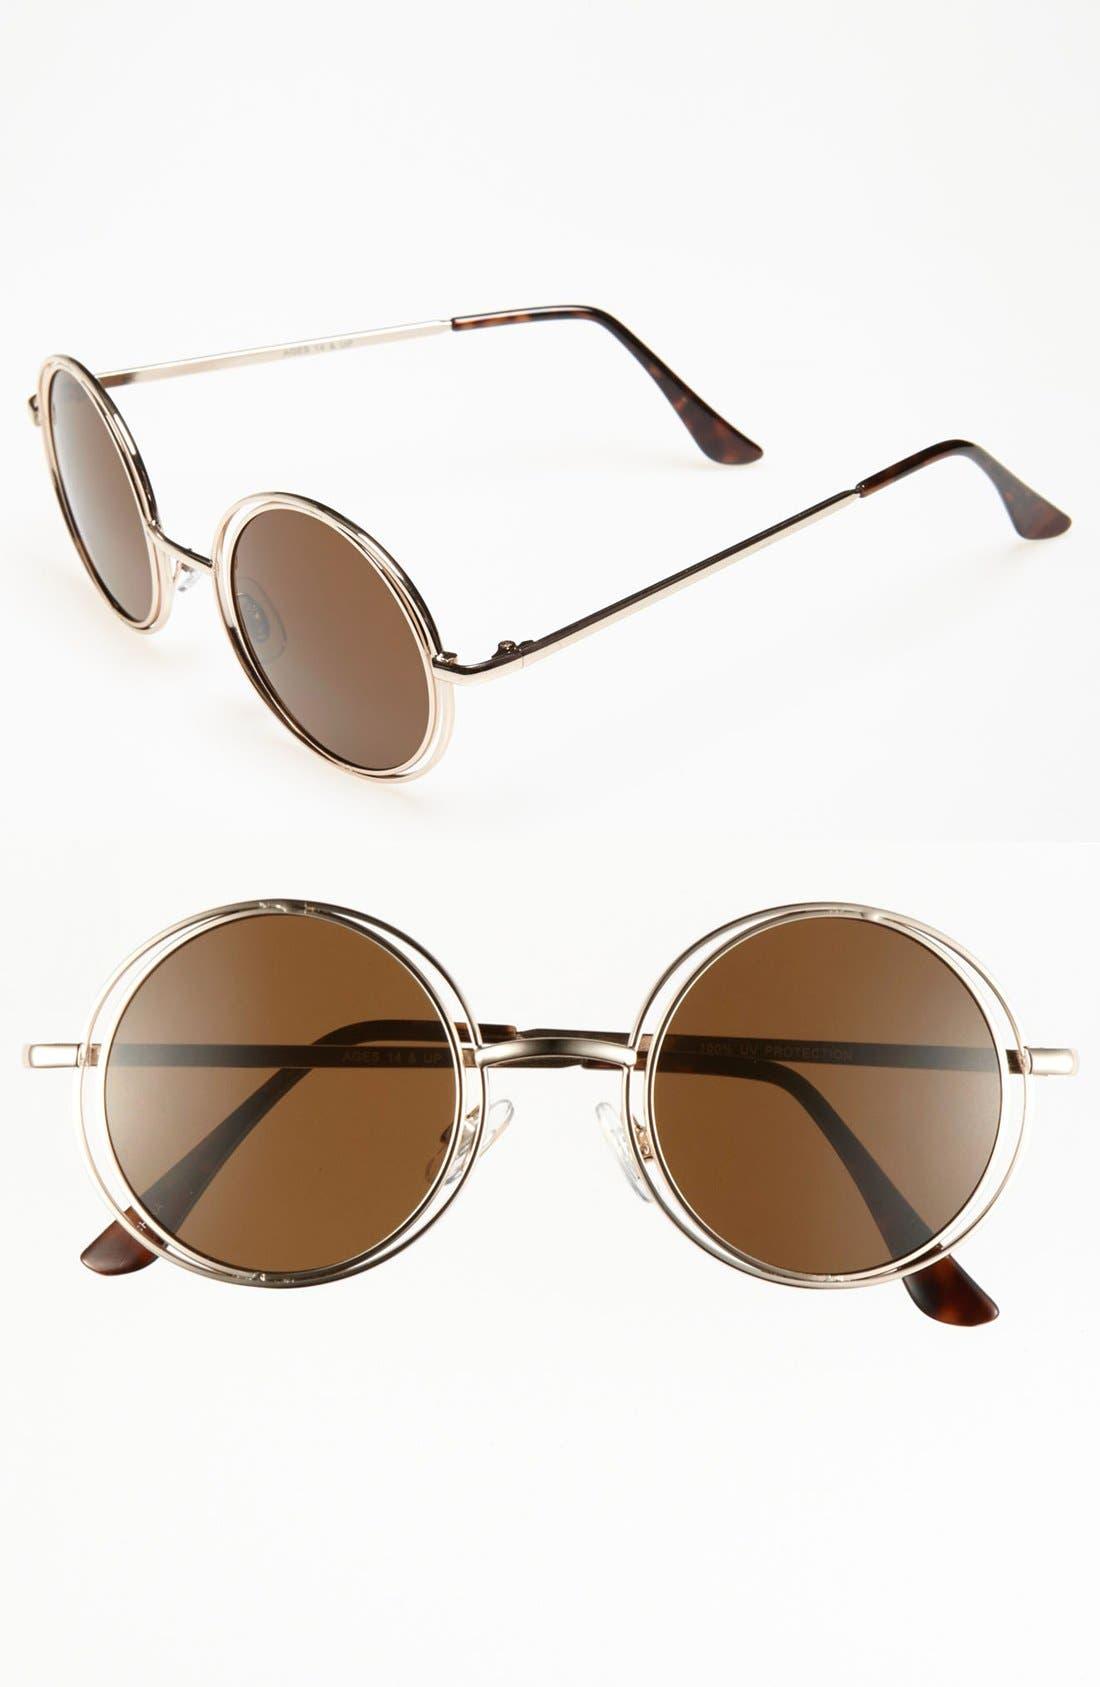 Alternate Image 1 Selected - FE NY 'Modusopera' Sunglasses